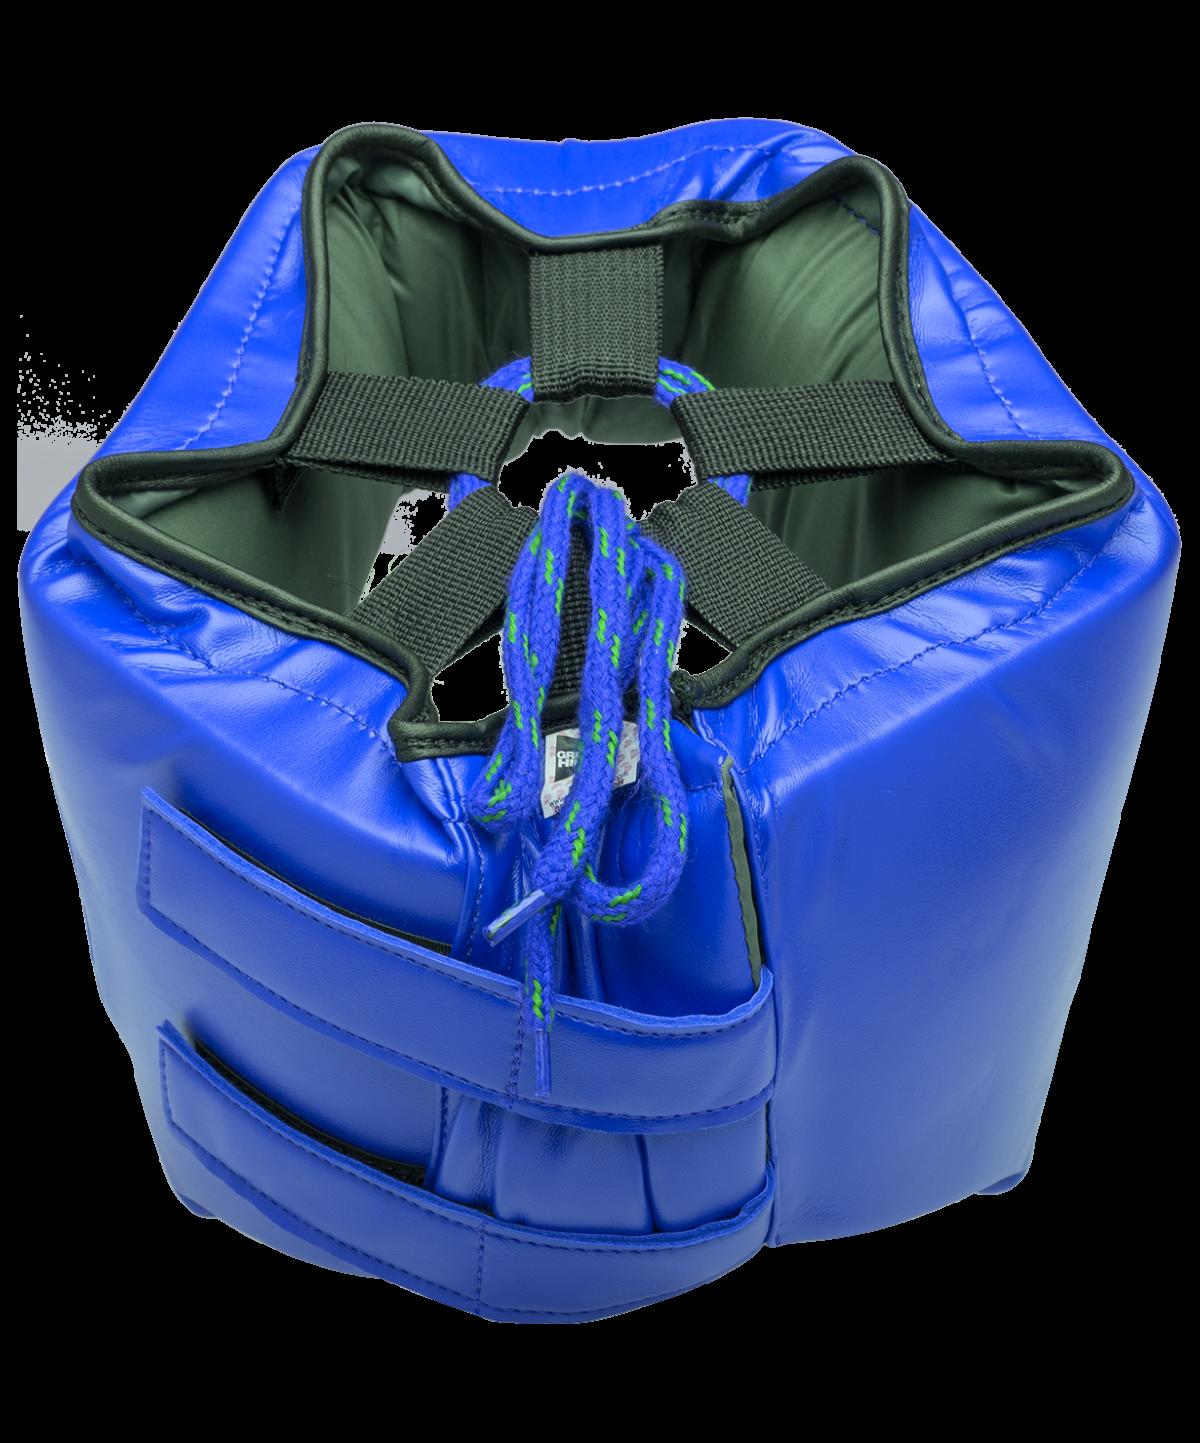 GREEN HILL Шлем открытый Orbit  HGO-4030: синий - 3